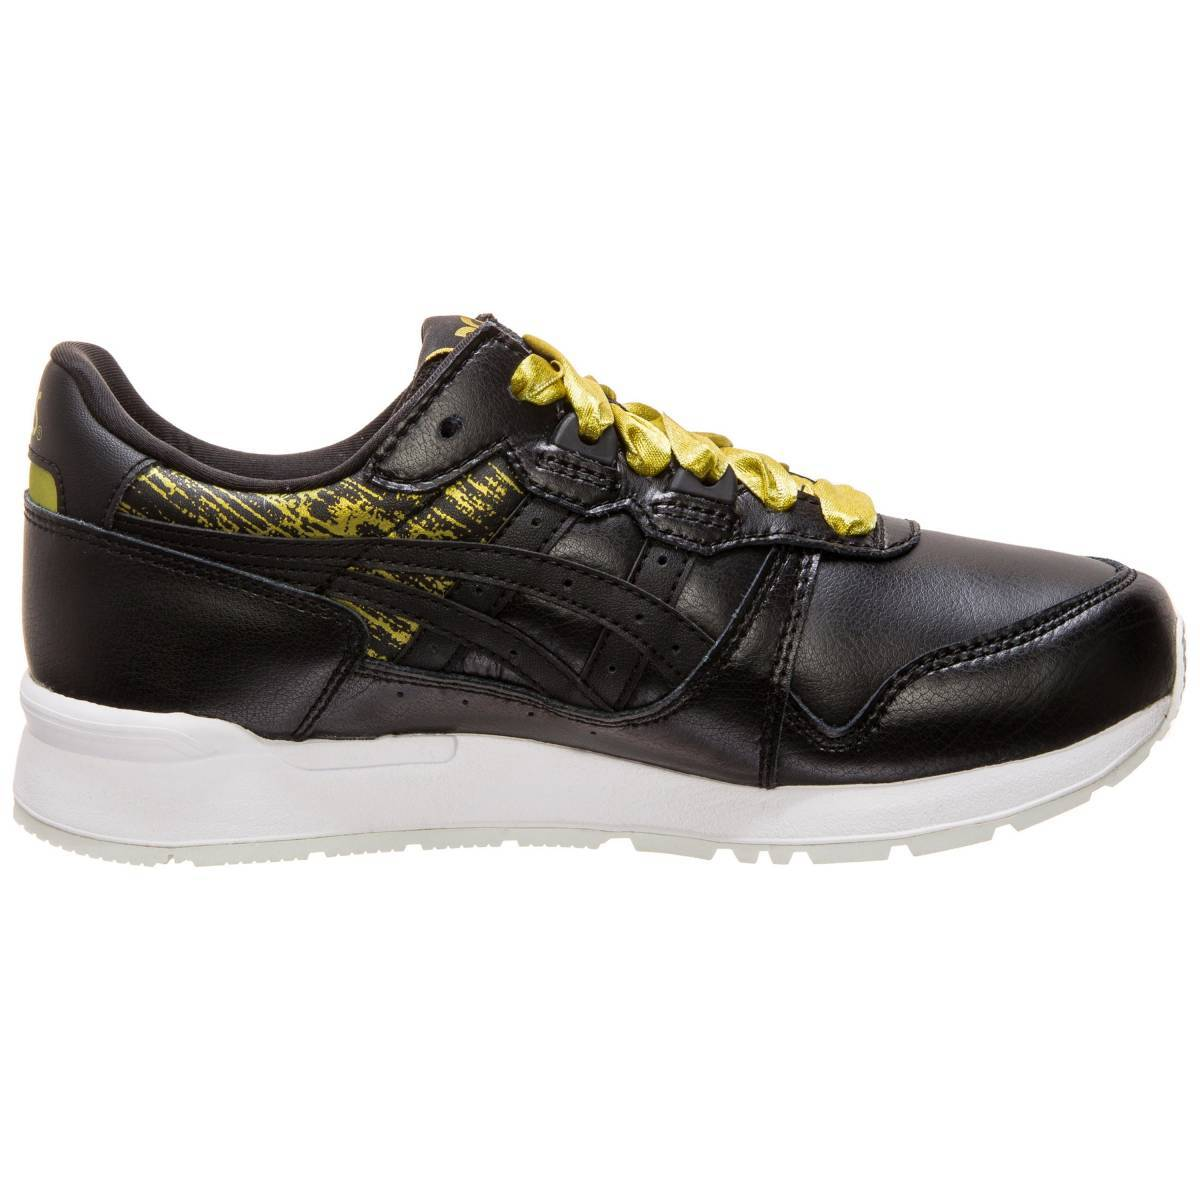 ASICS Women's Gel Lyte Trainers Various Colours 4549957533095 - 3.5 UK Black